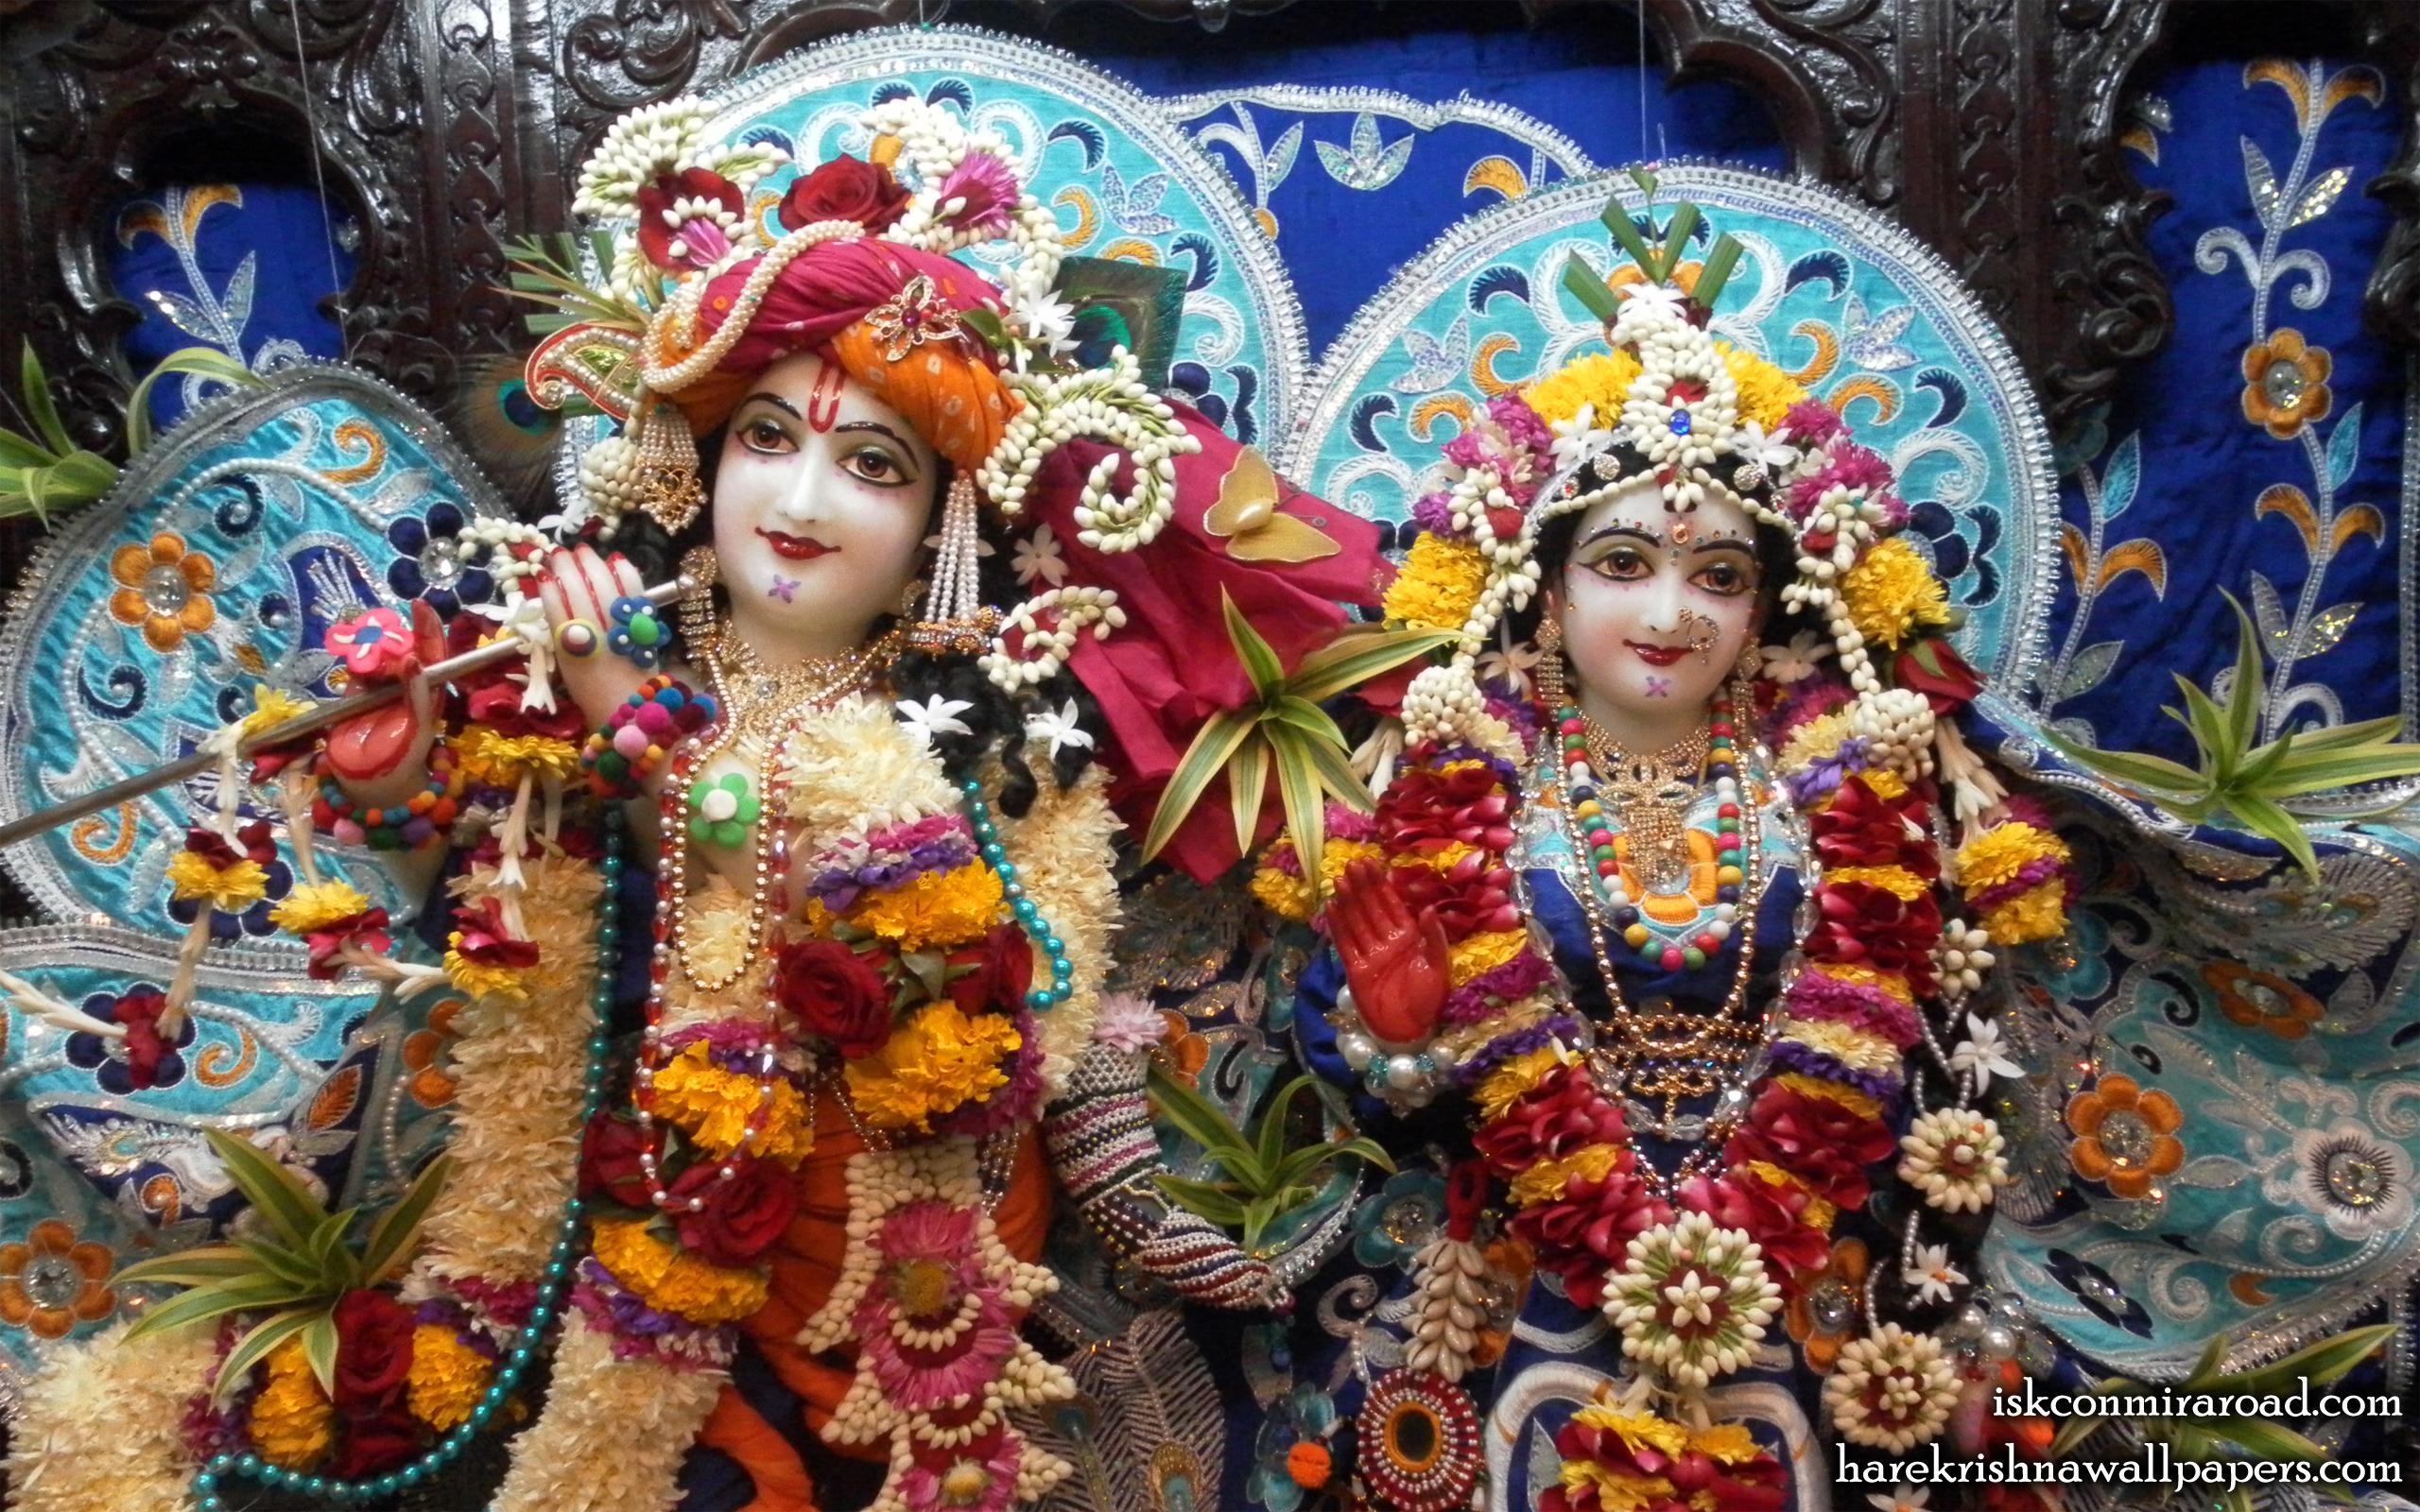 Sri Sri Radha Giridhari Close up Wallpaper (018) Size 2560x1600 Download